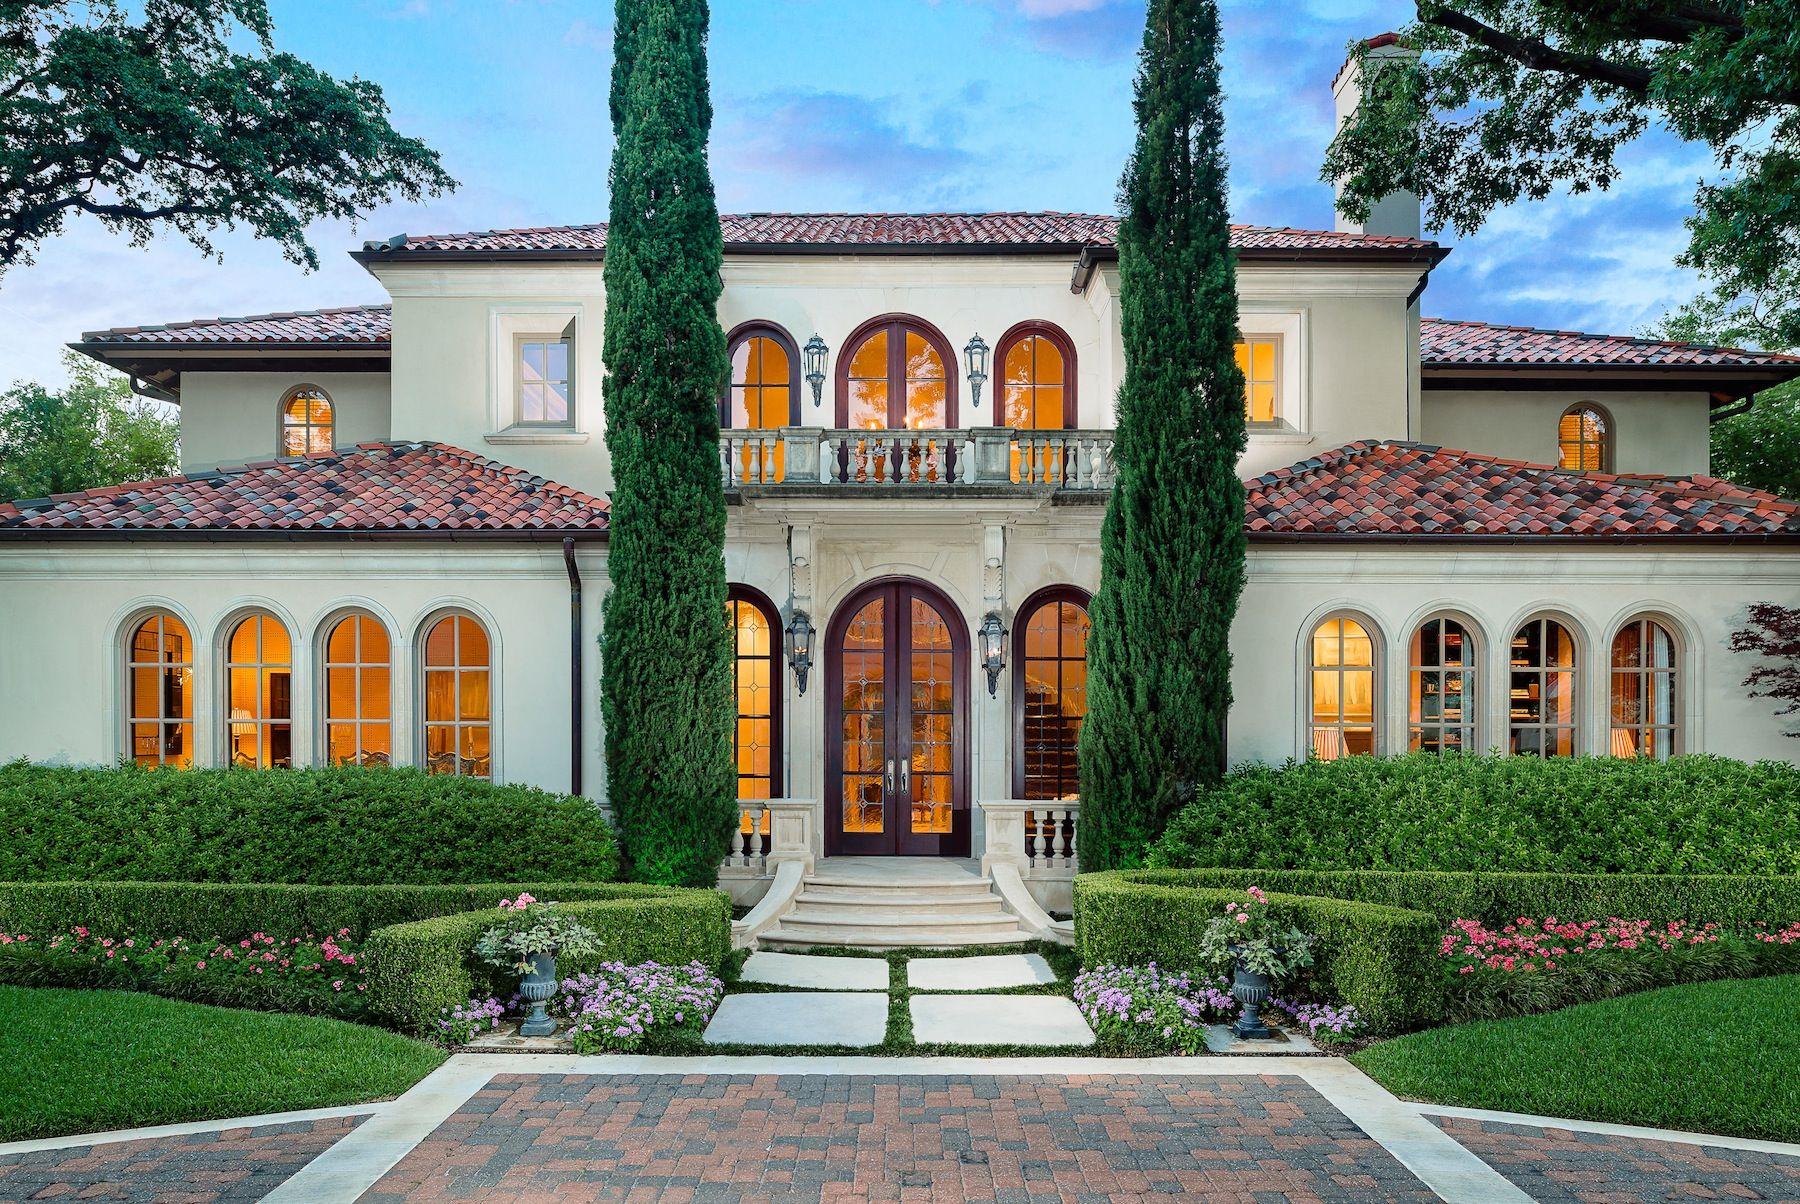 4236 Lorraine Briggs Freeman Sothebys Luxury Home  For Sale In Dallas Fort Worth Exterior (1800×1204)